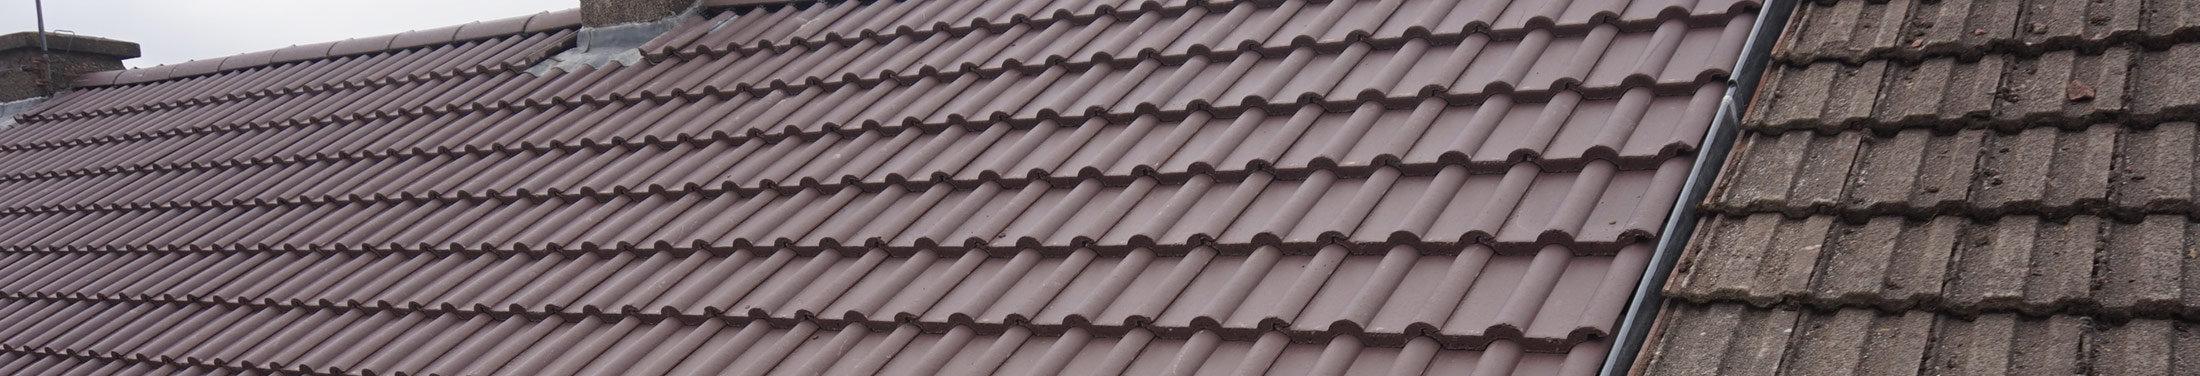 Roofers Lanarkshire